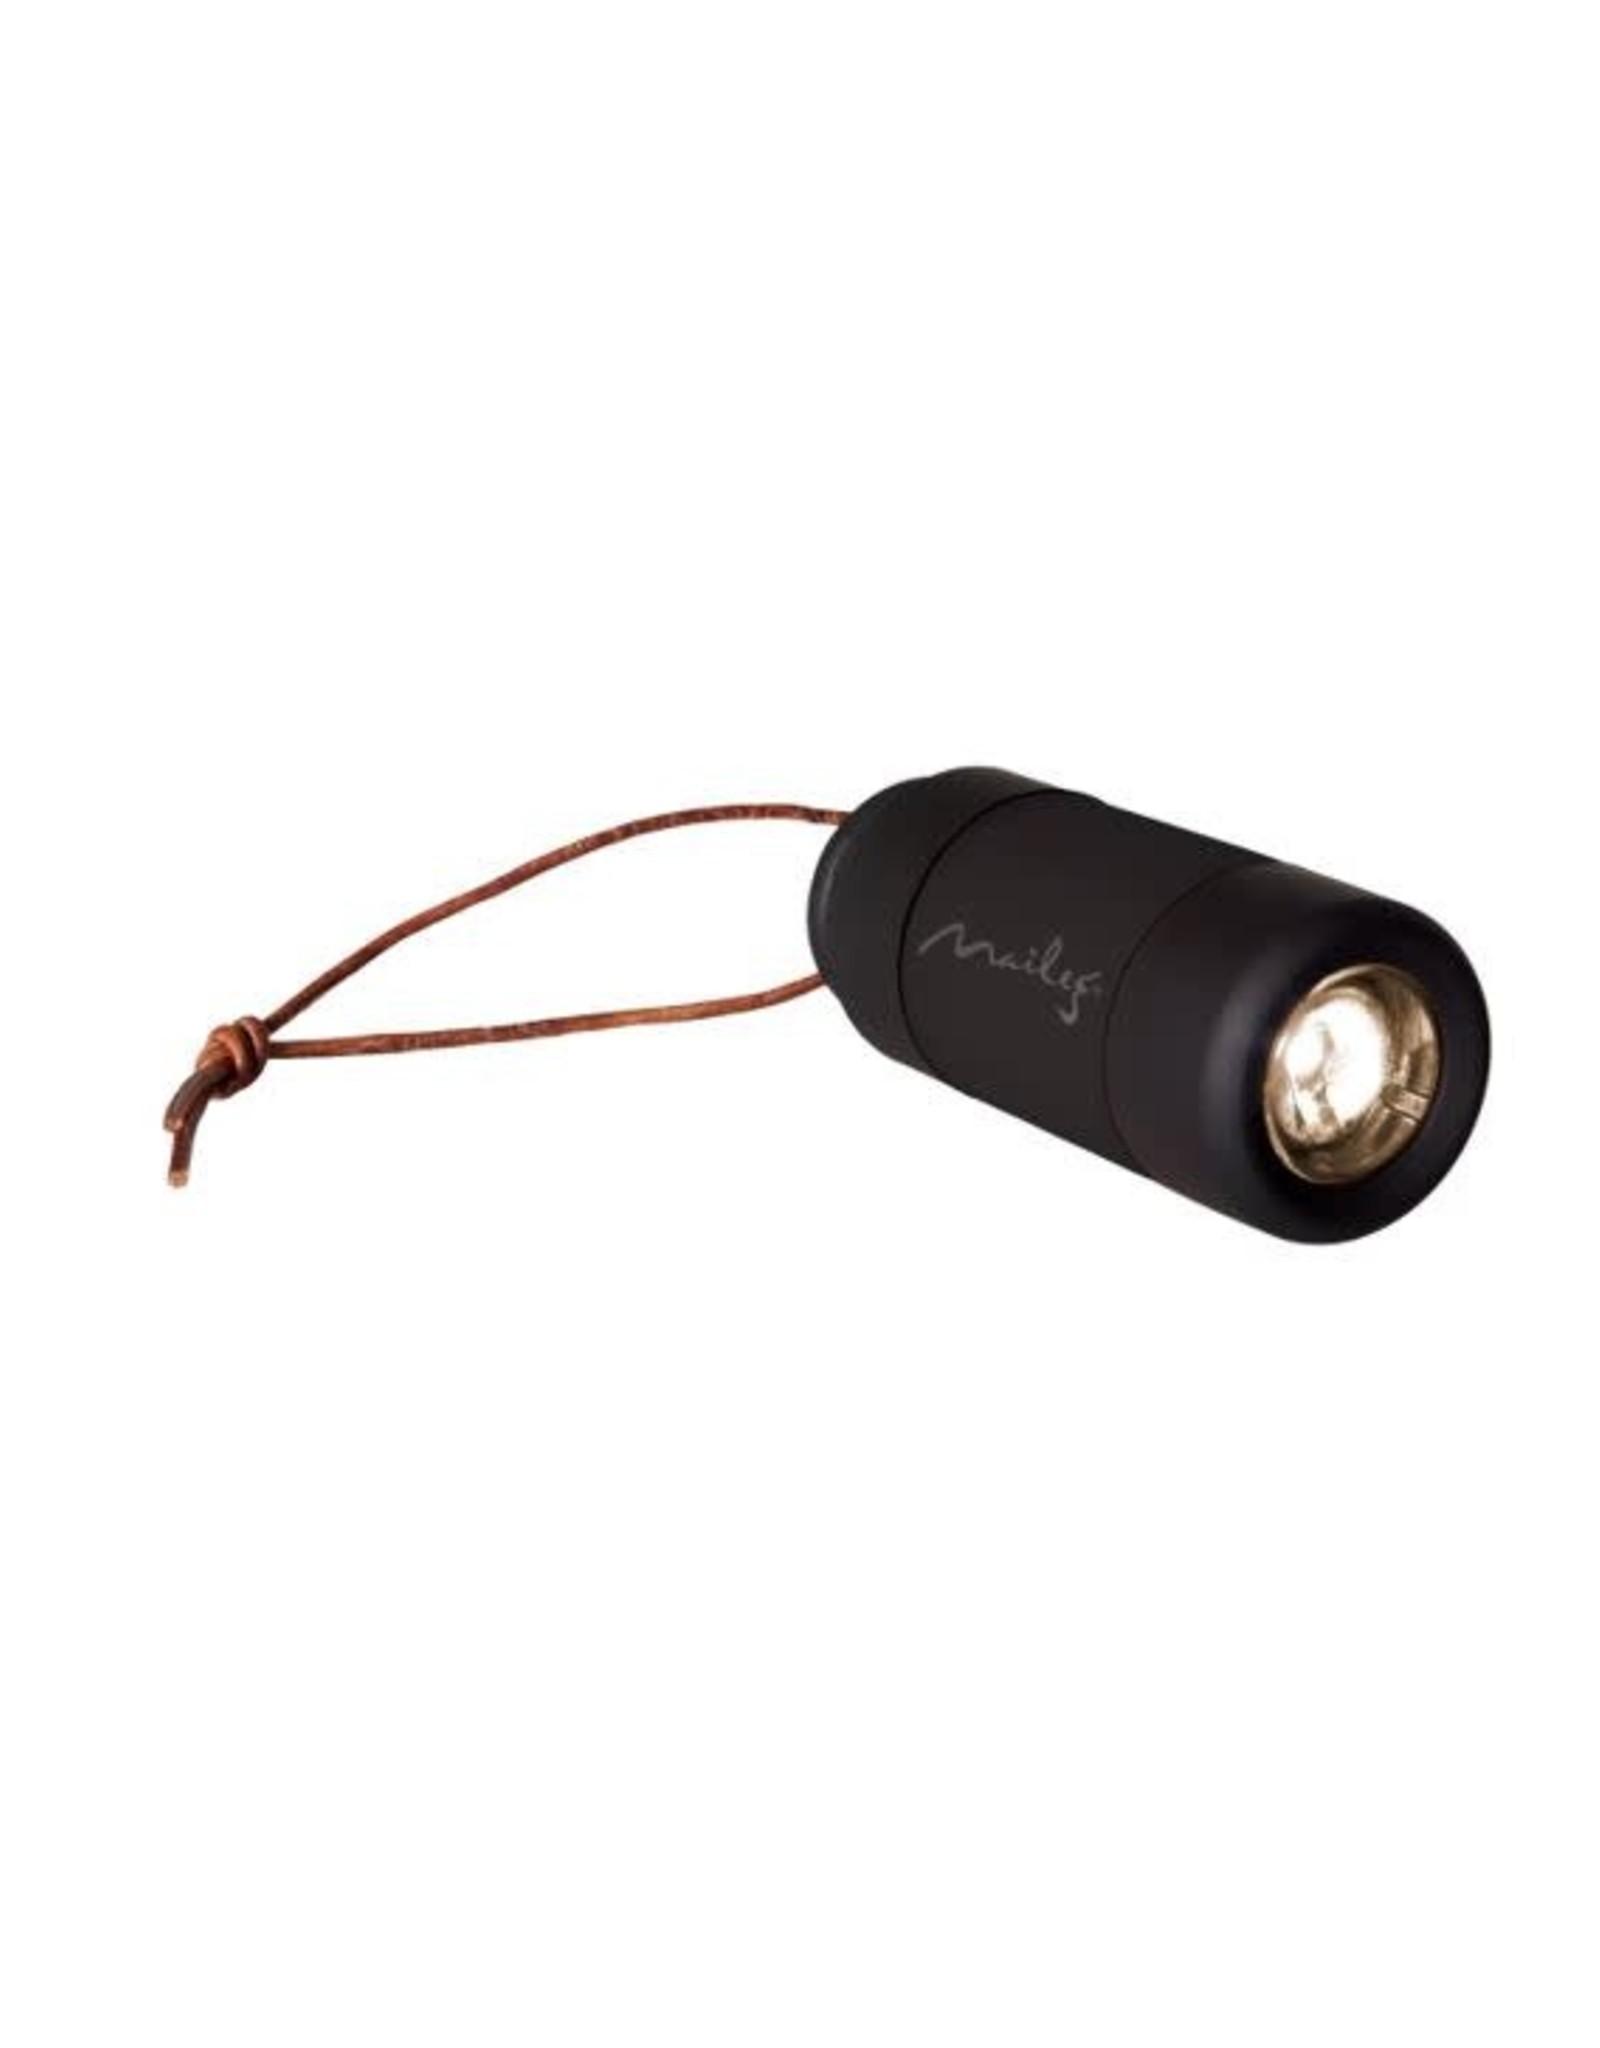 Mini Lampe de Poche - Noire